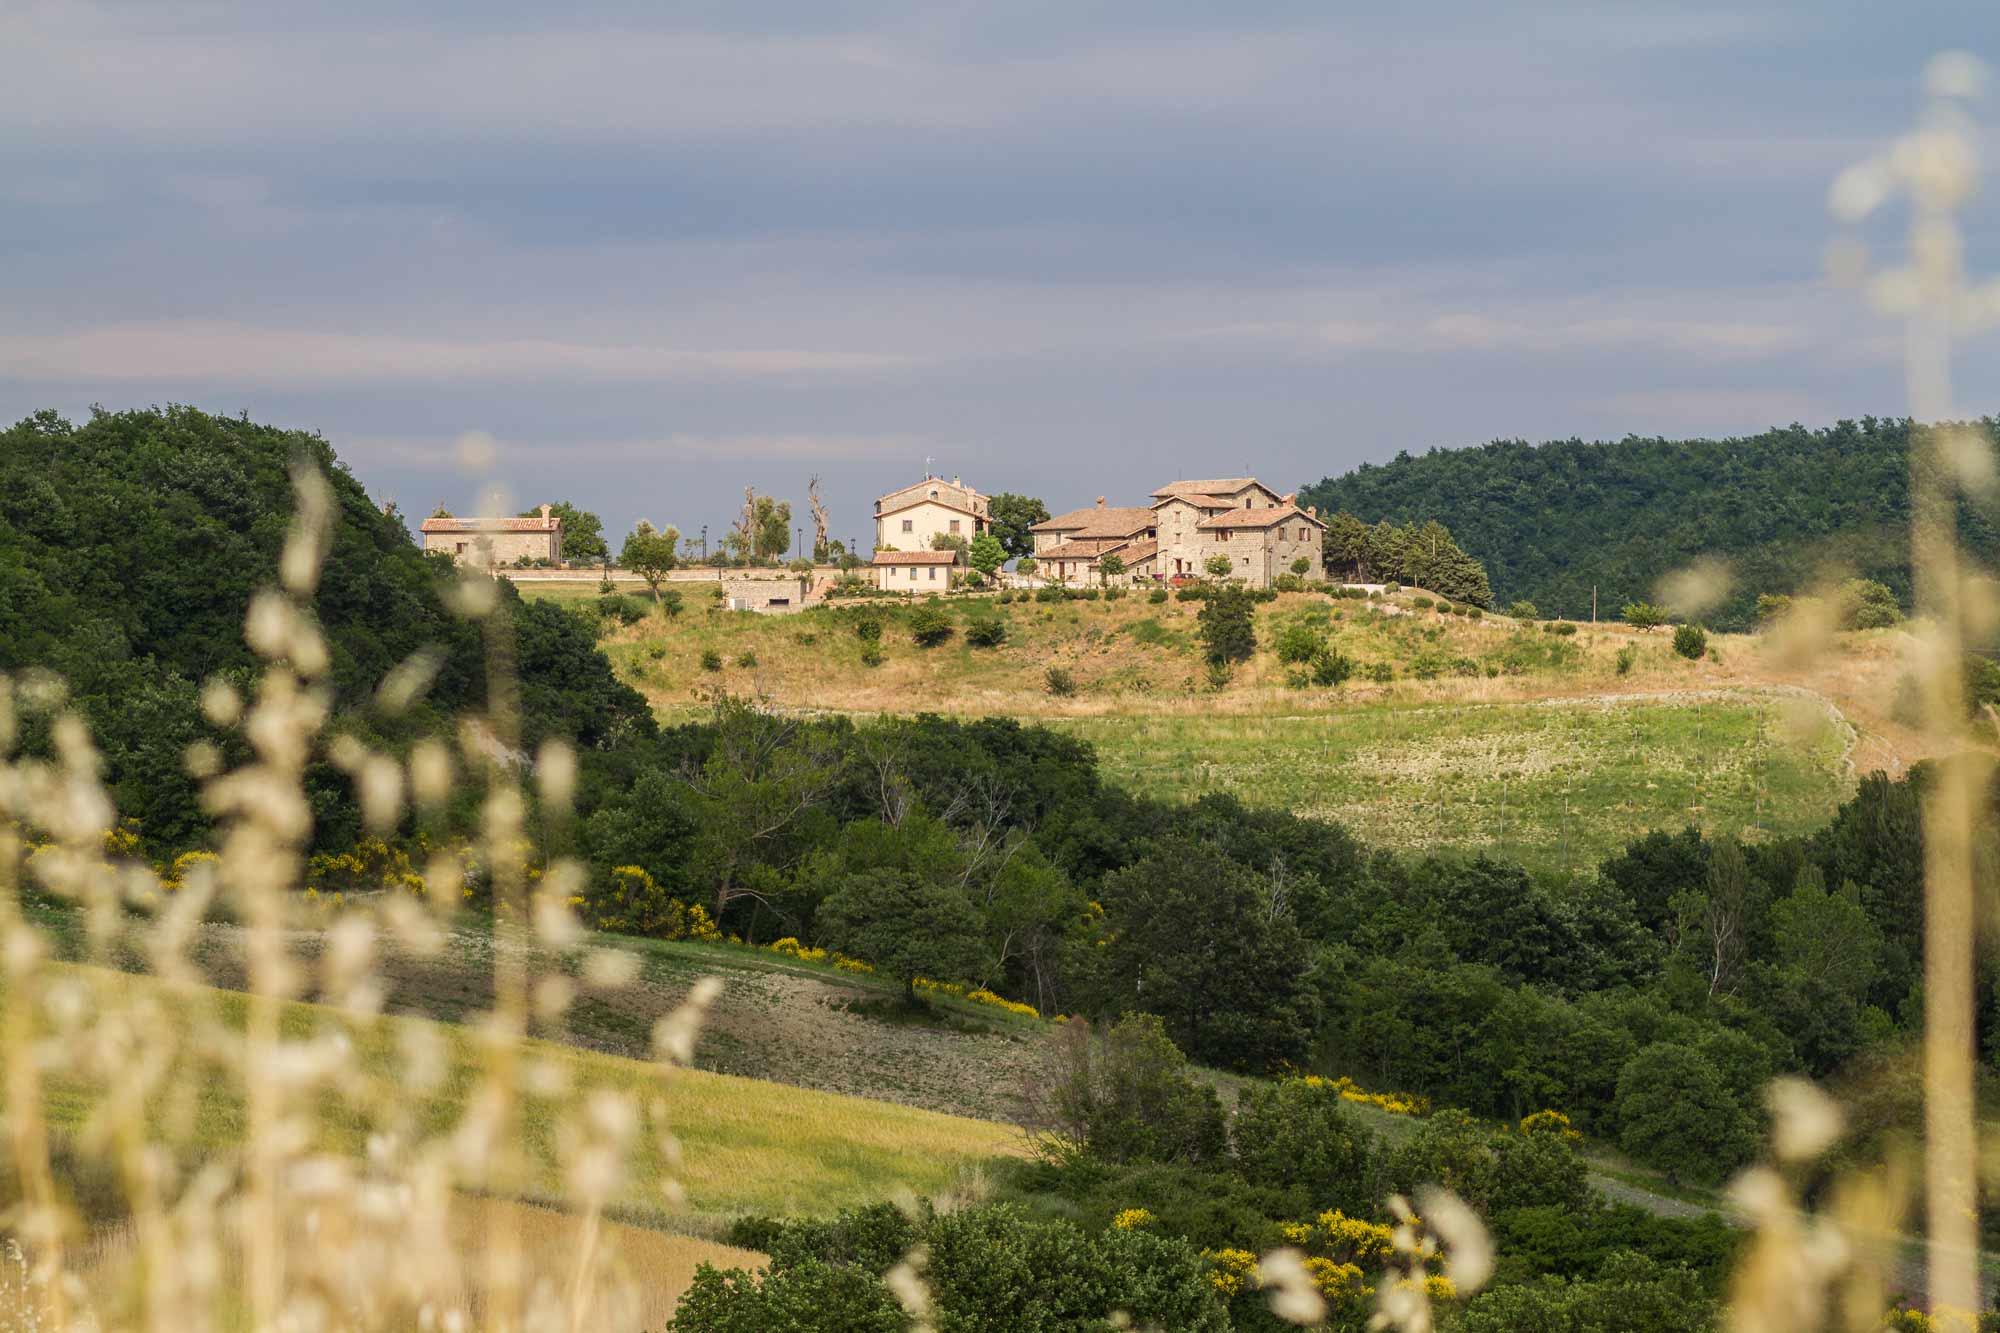 Location - Borgo Santa Cecilia